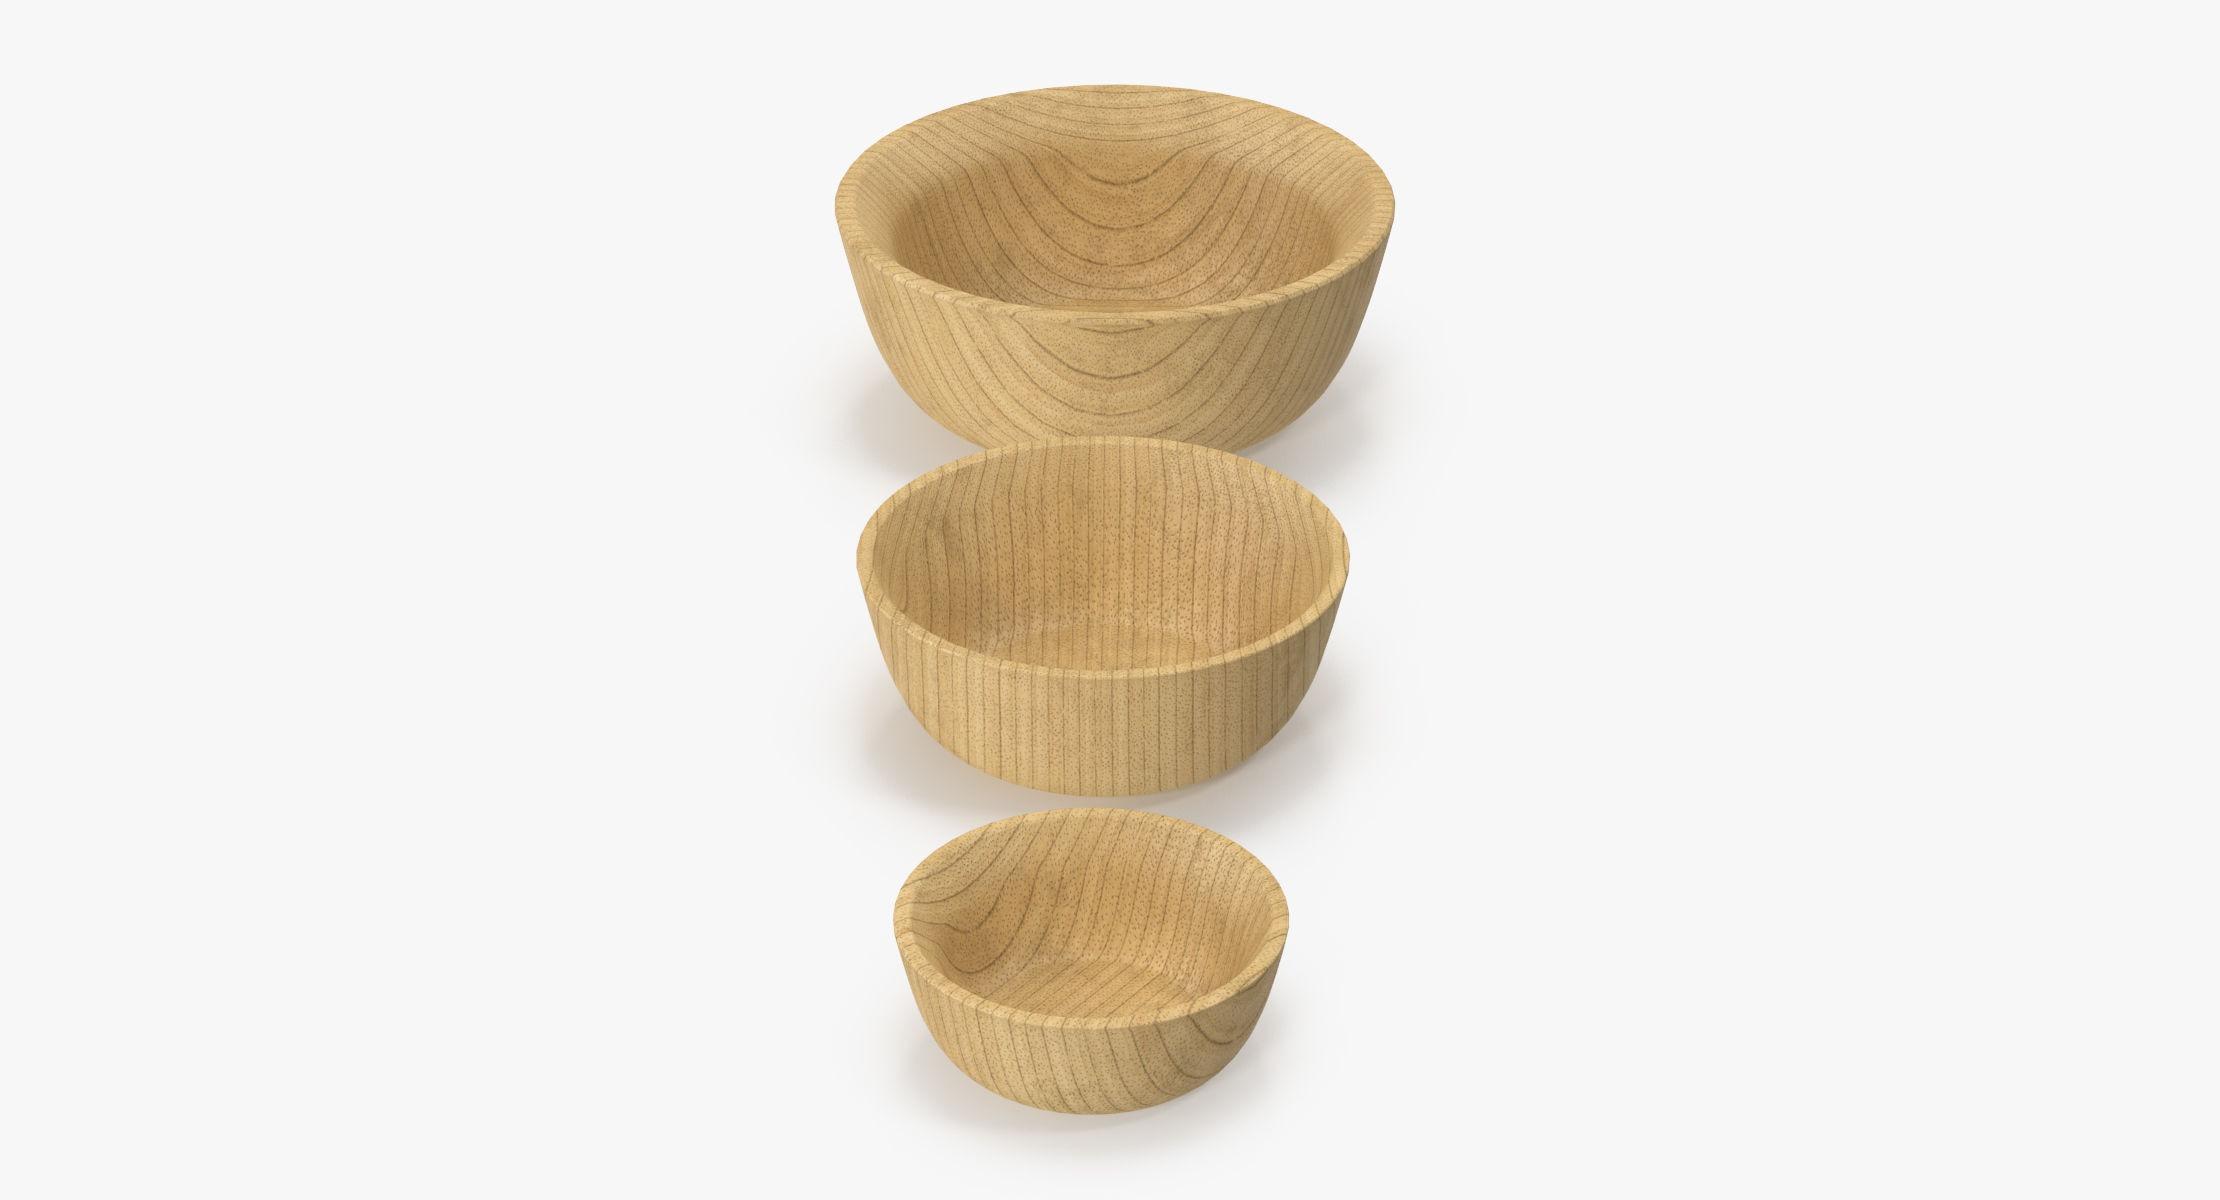 Bamboo Bowl - reel 1